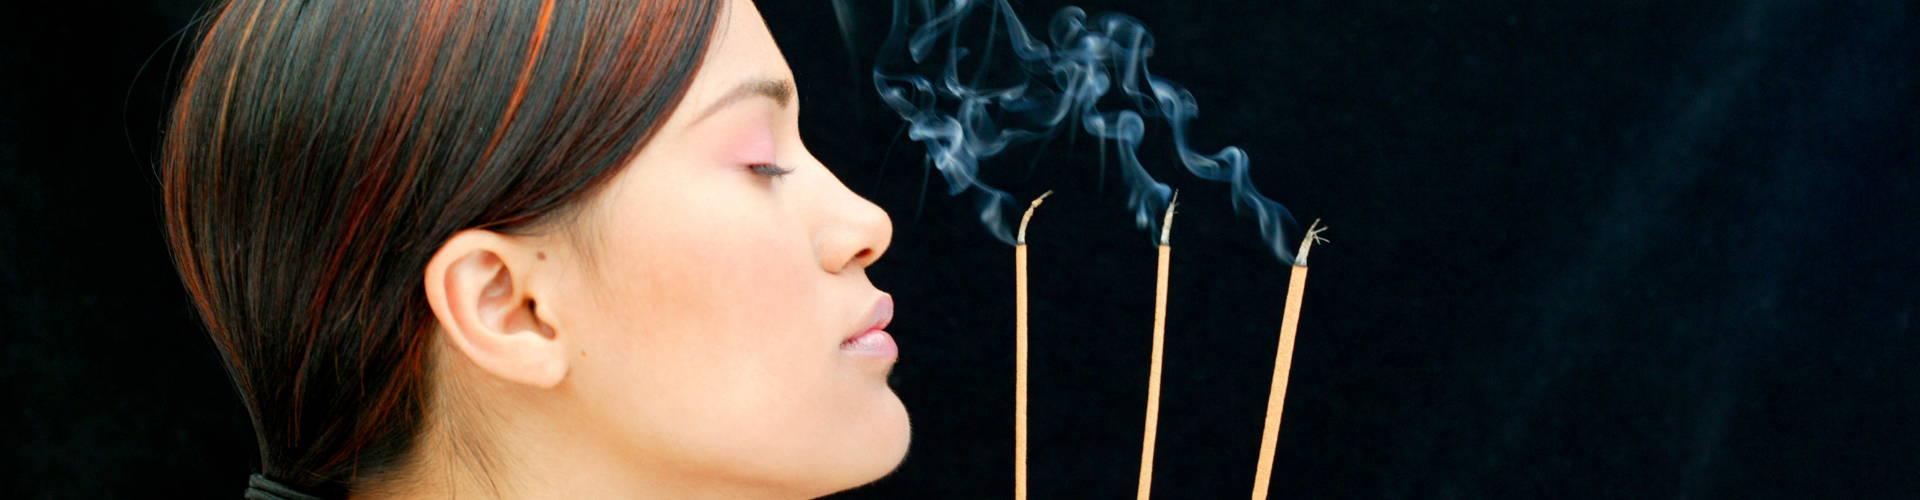 sandalwood incense relax